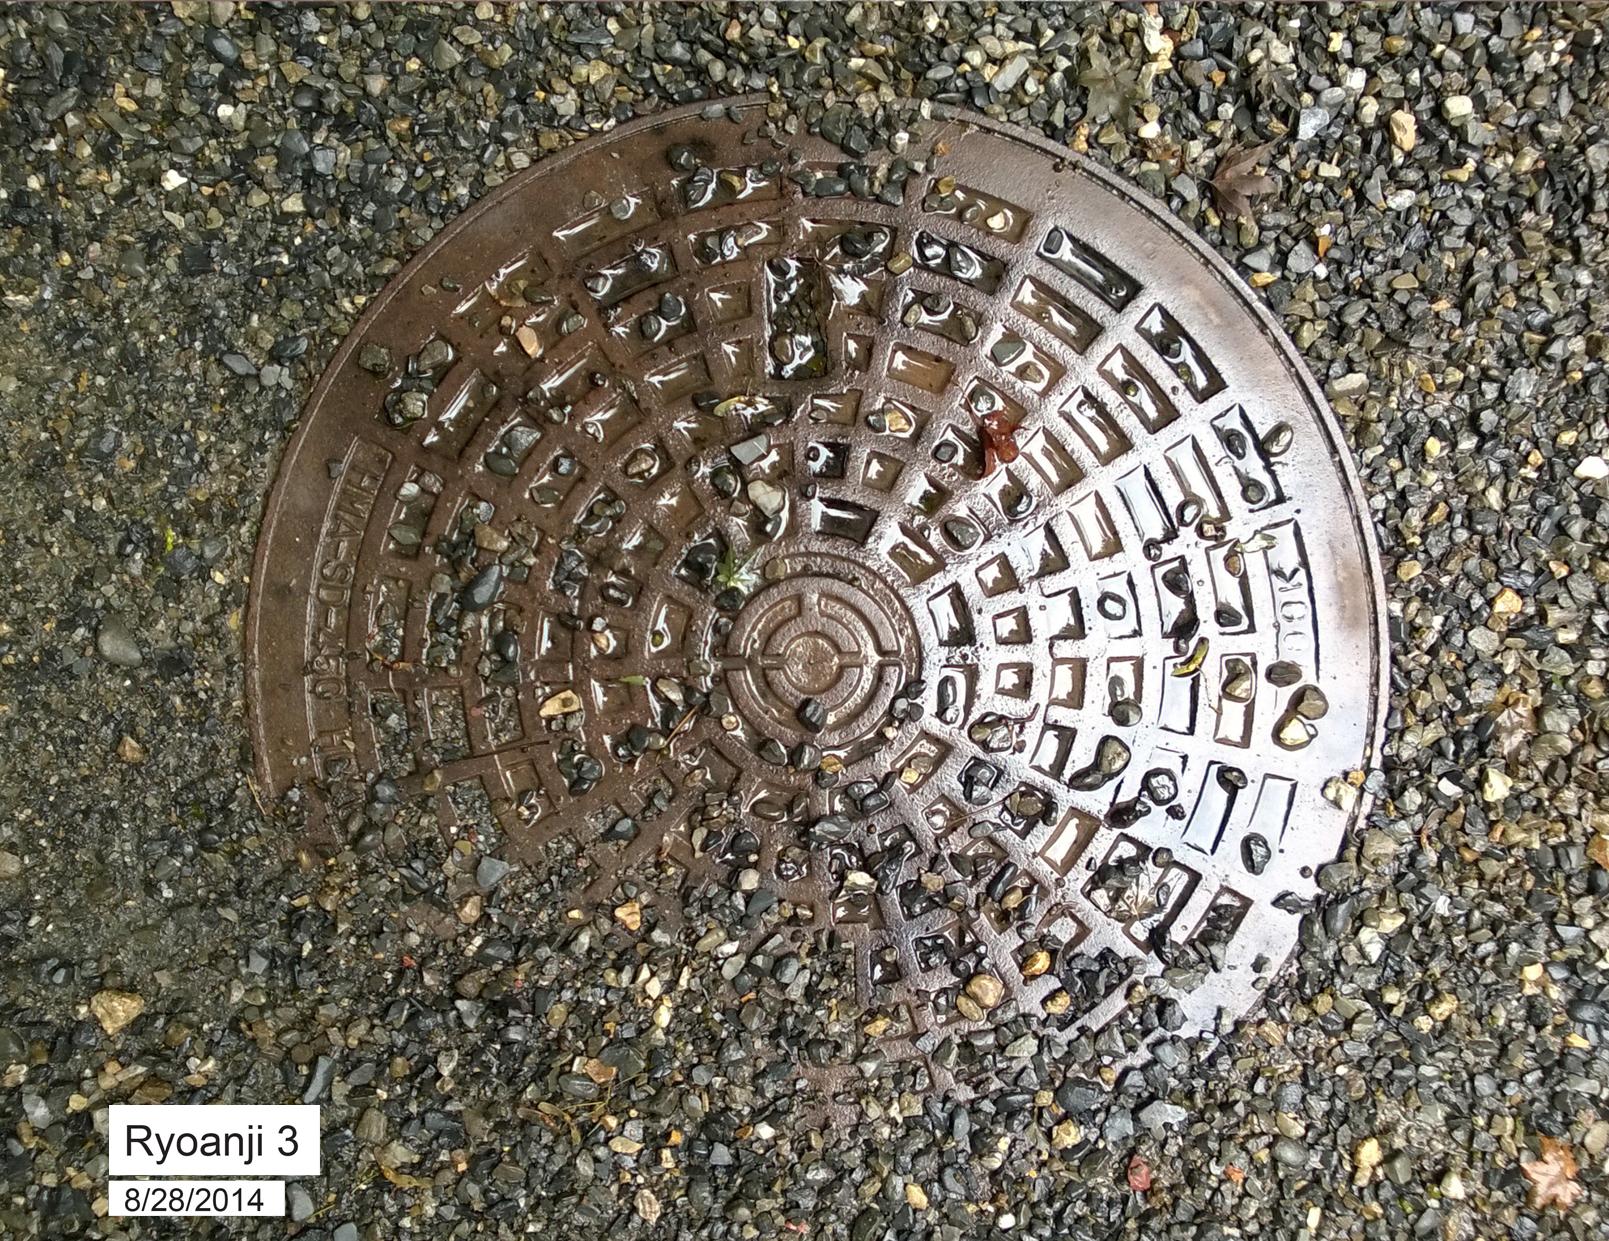 Manhole_Zoom_3.png